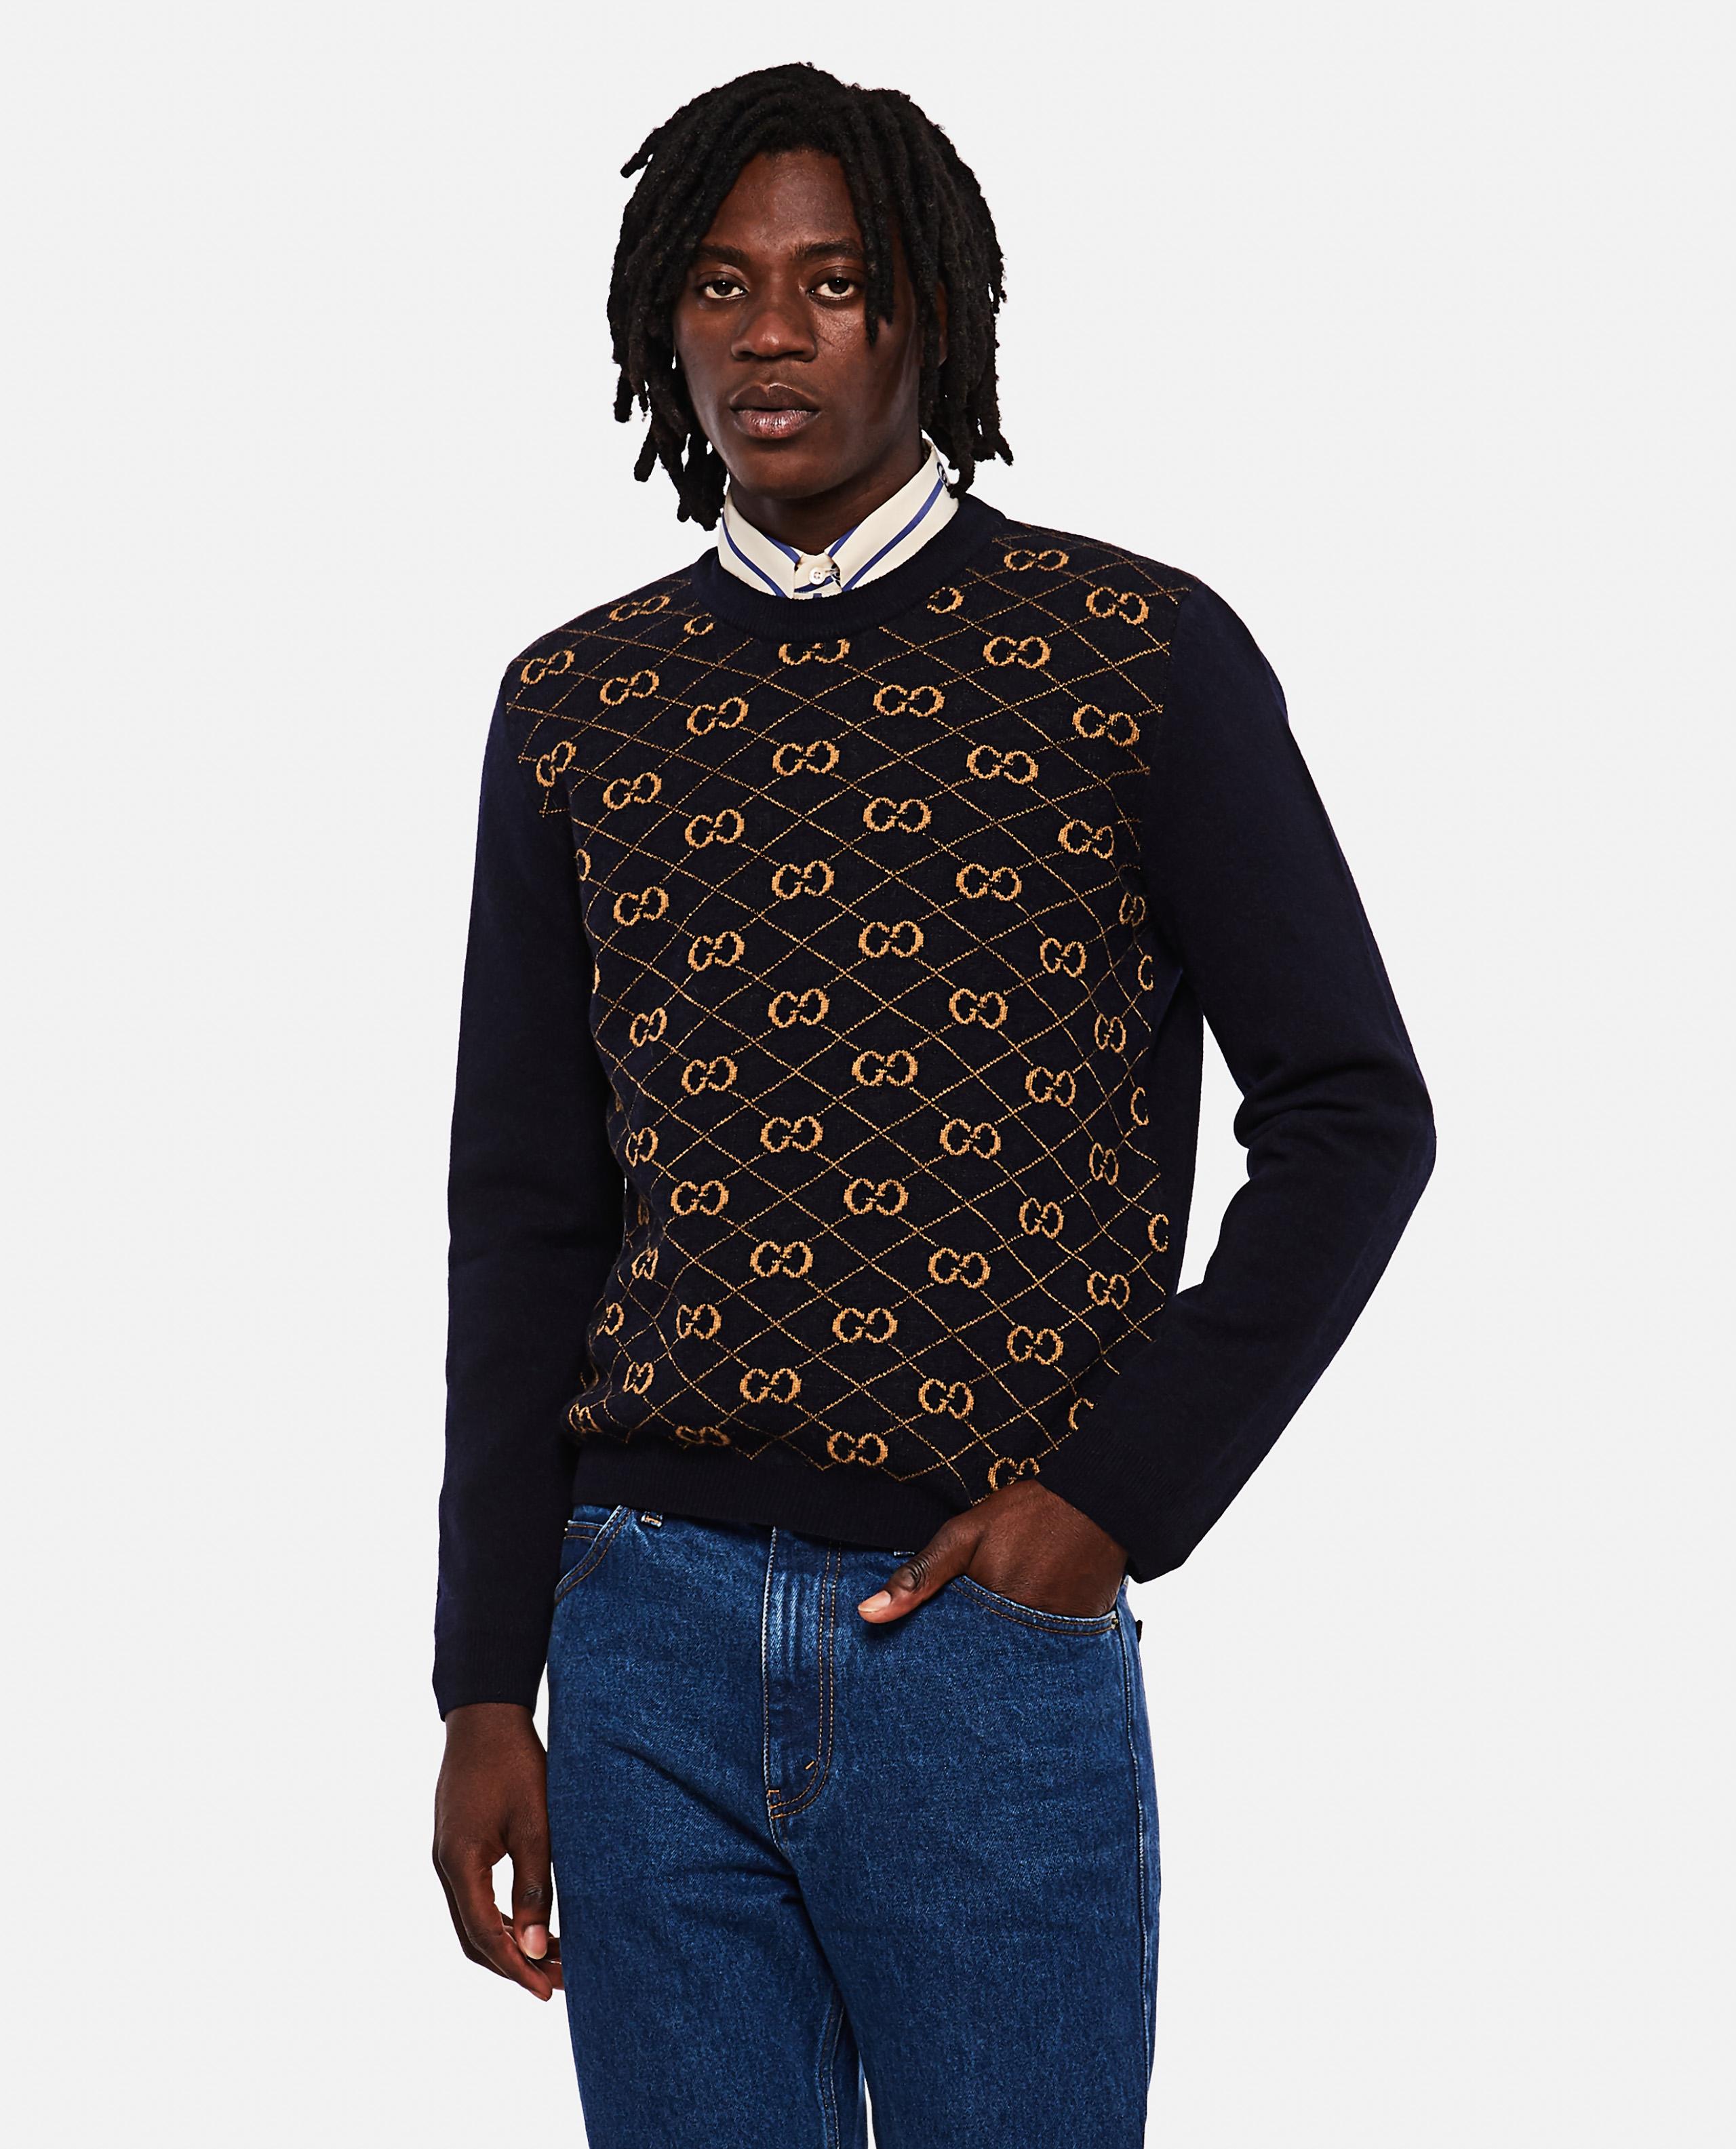 GG sweater